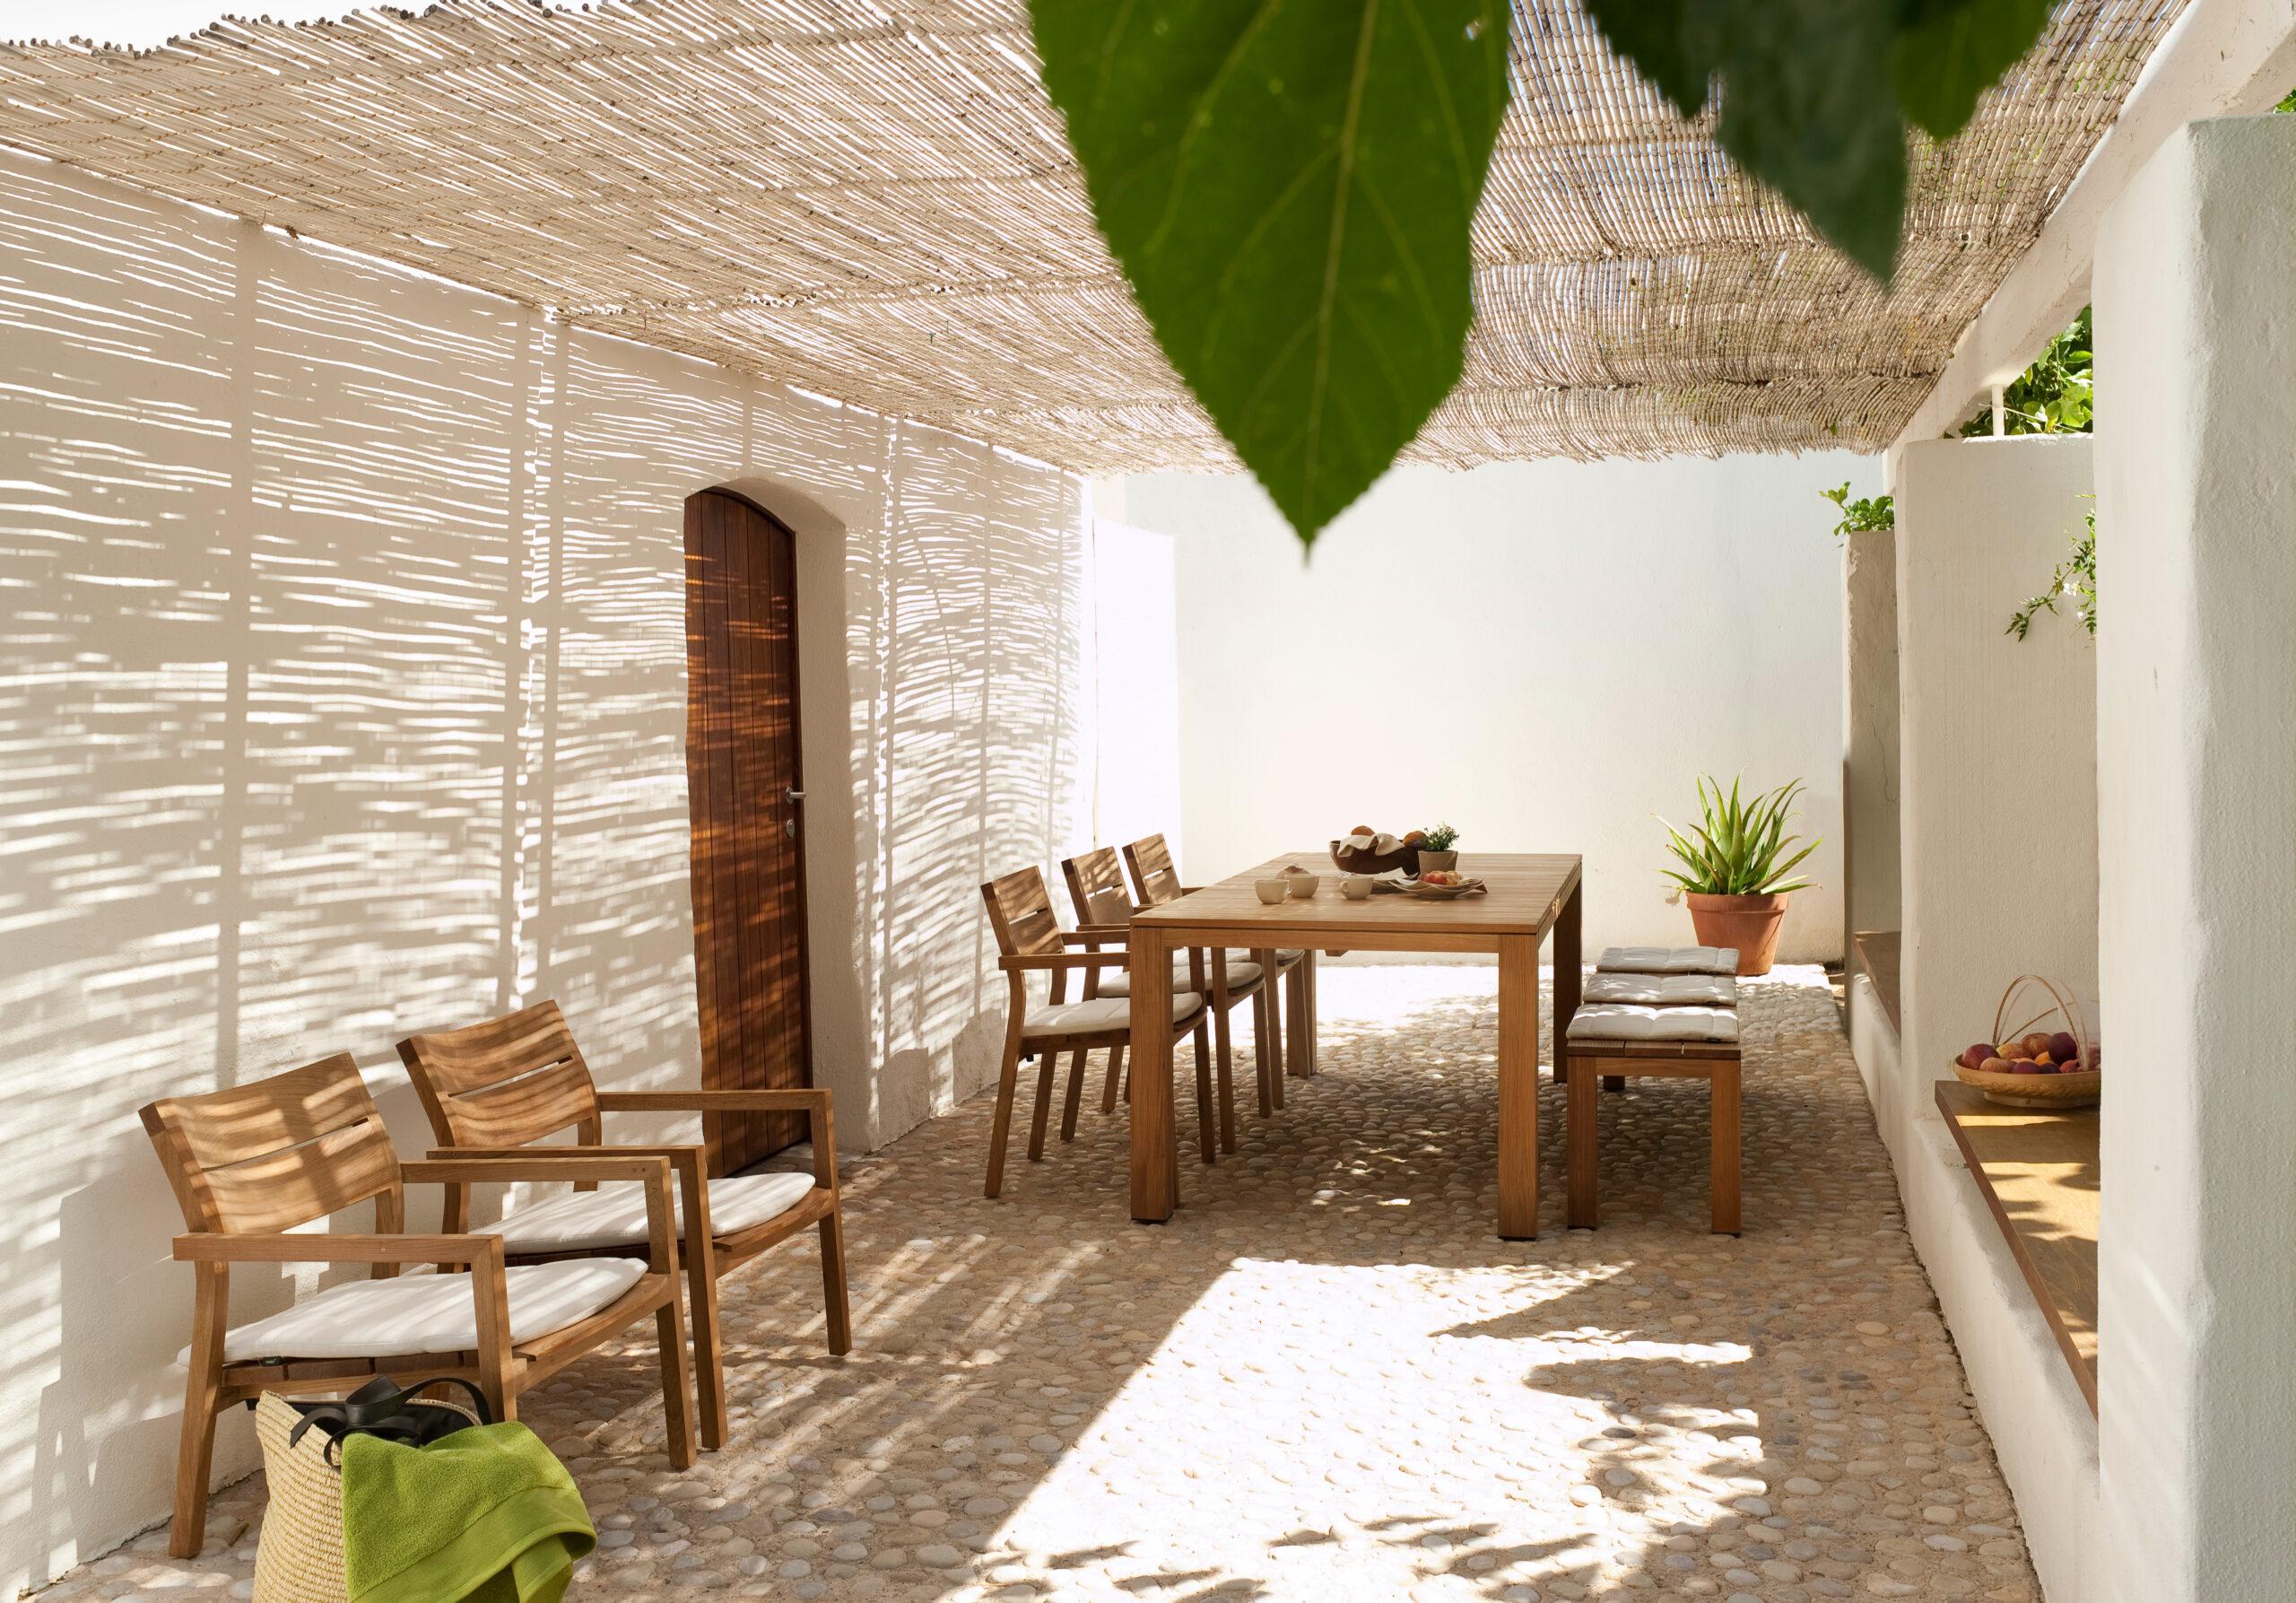 Luxury outdoor furniture